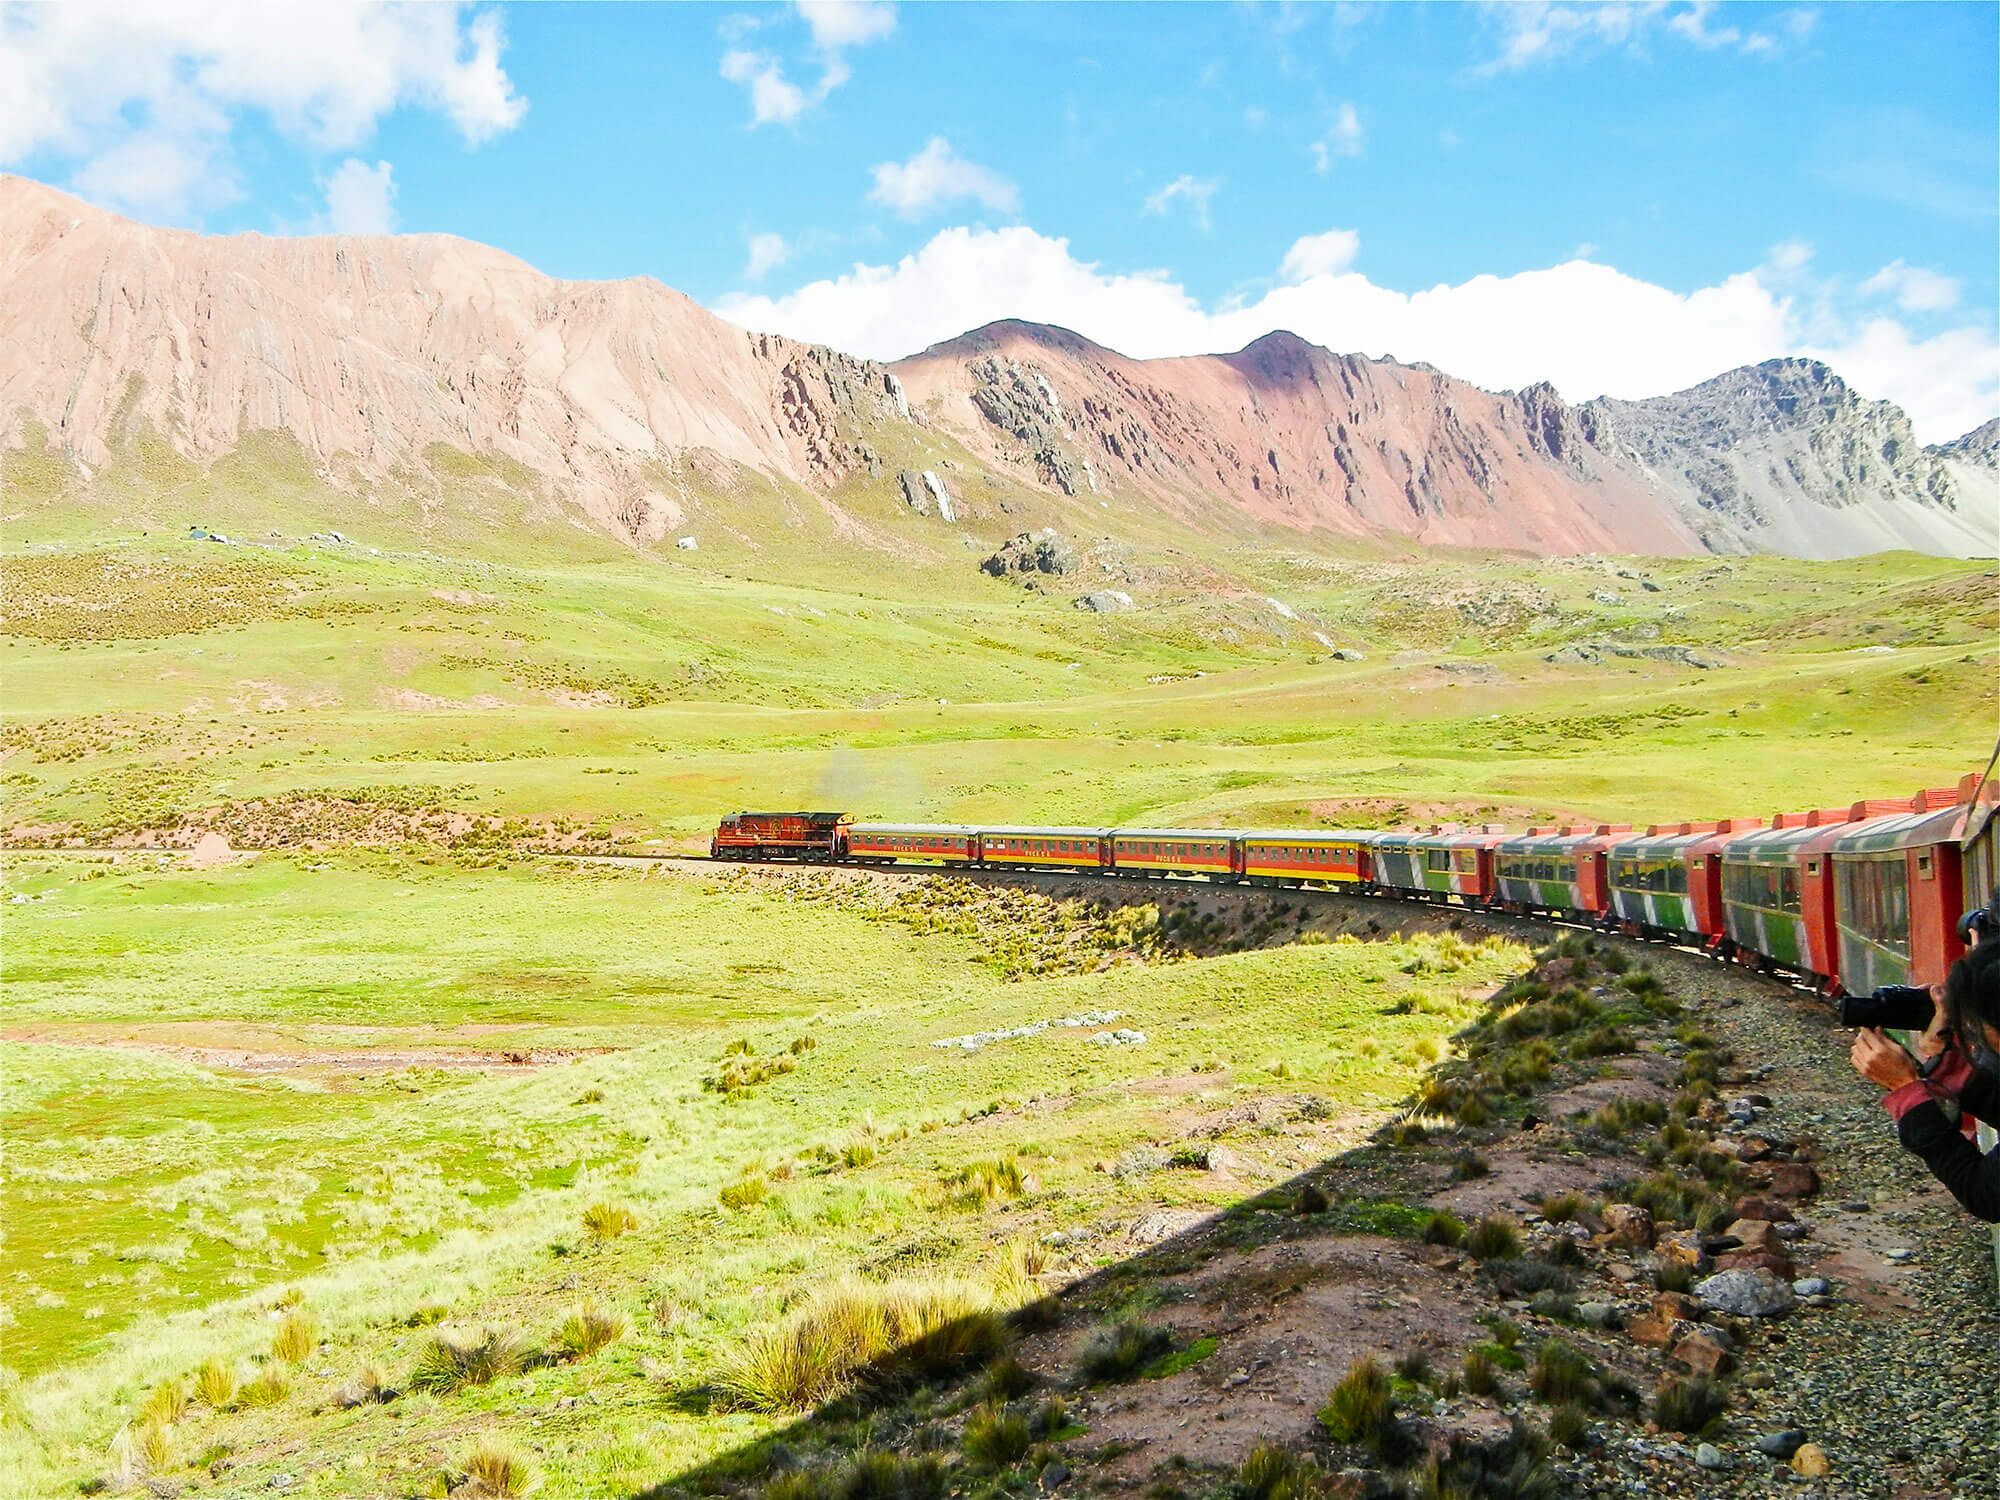 Train Lima - Huancayo between Galera and La Oroya